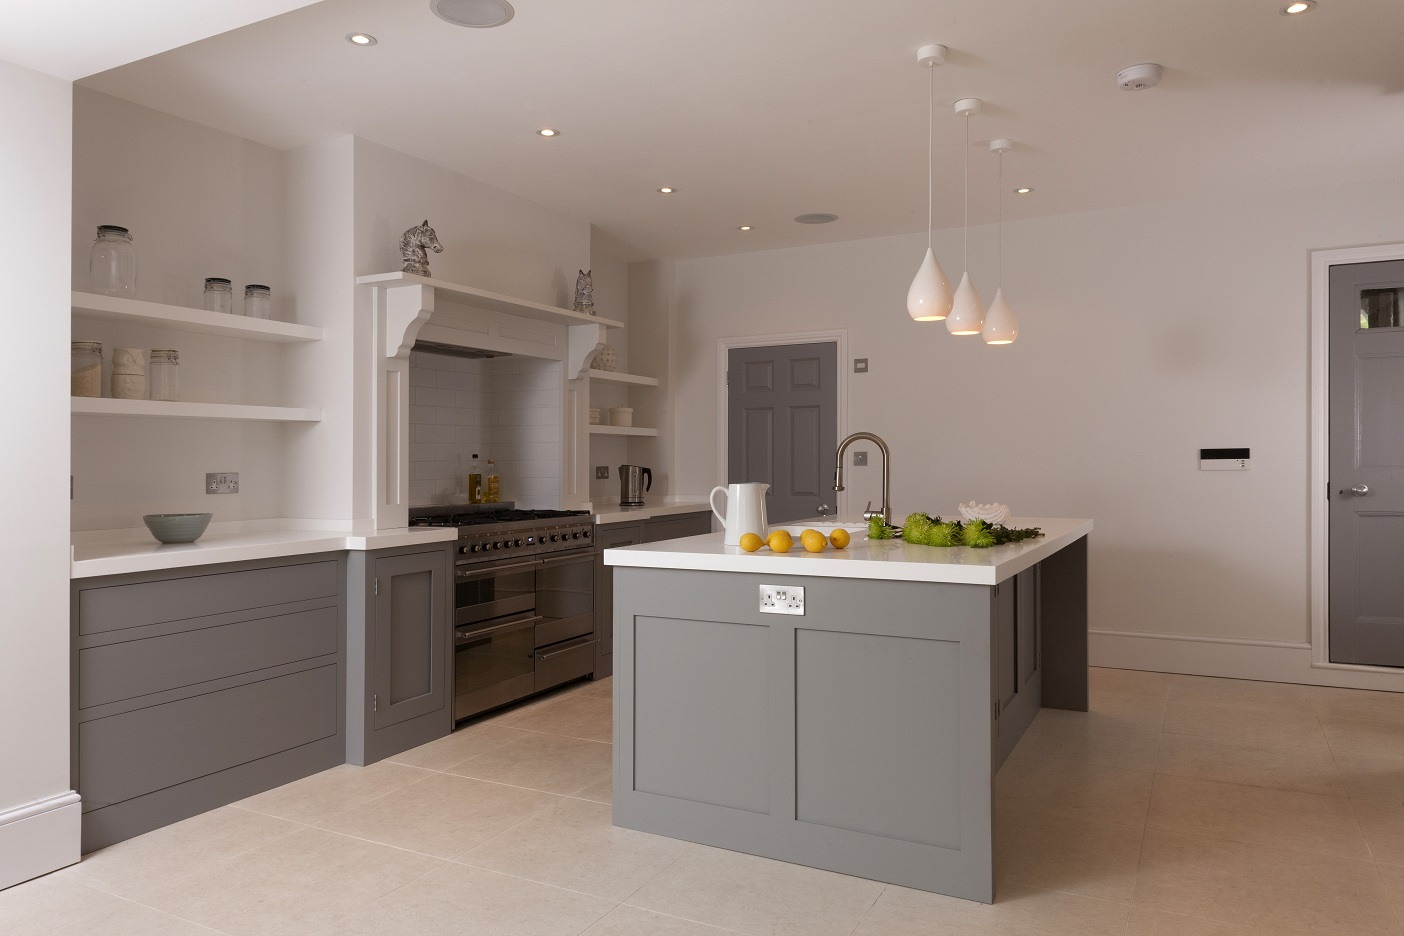 Handleless shaker in beautiful kitchens higham furniture for Kitchen farnichar dizain